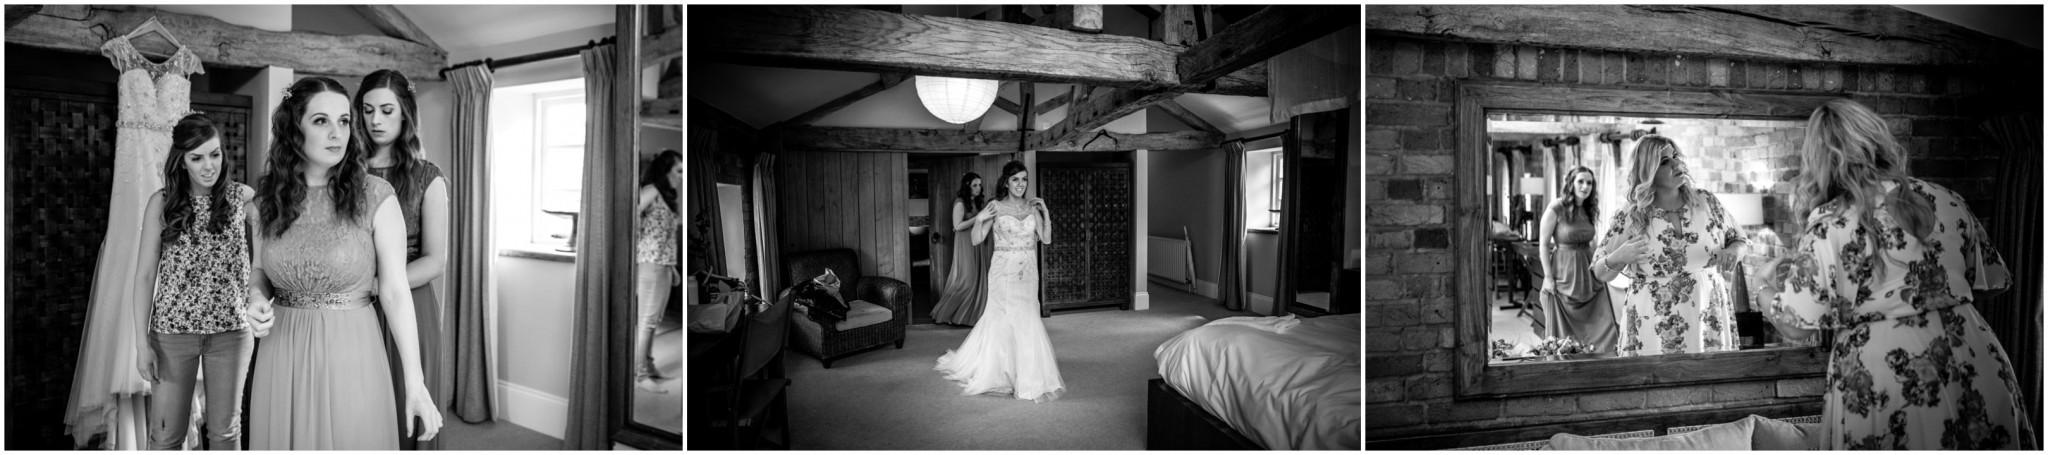 Wasing Park Wedding Photography Bridal prep